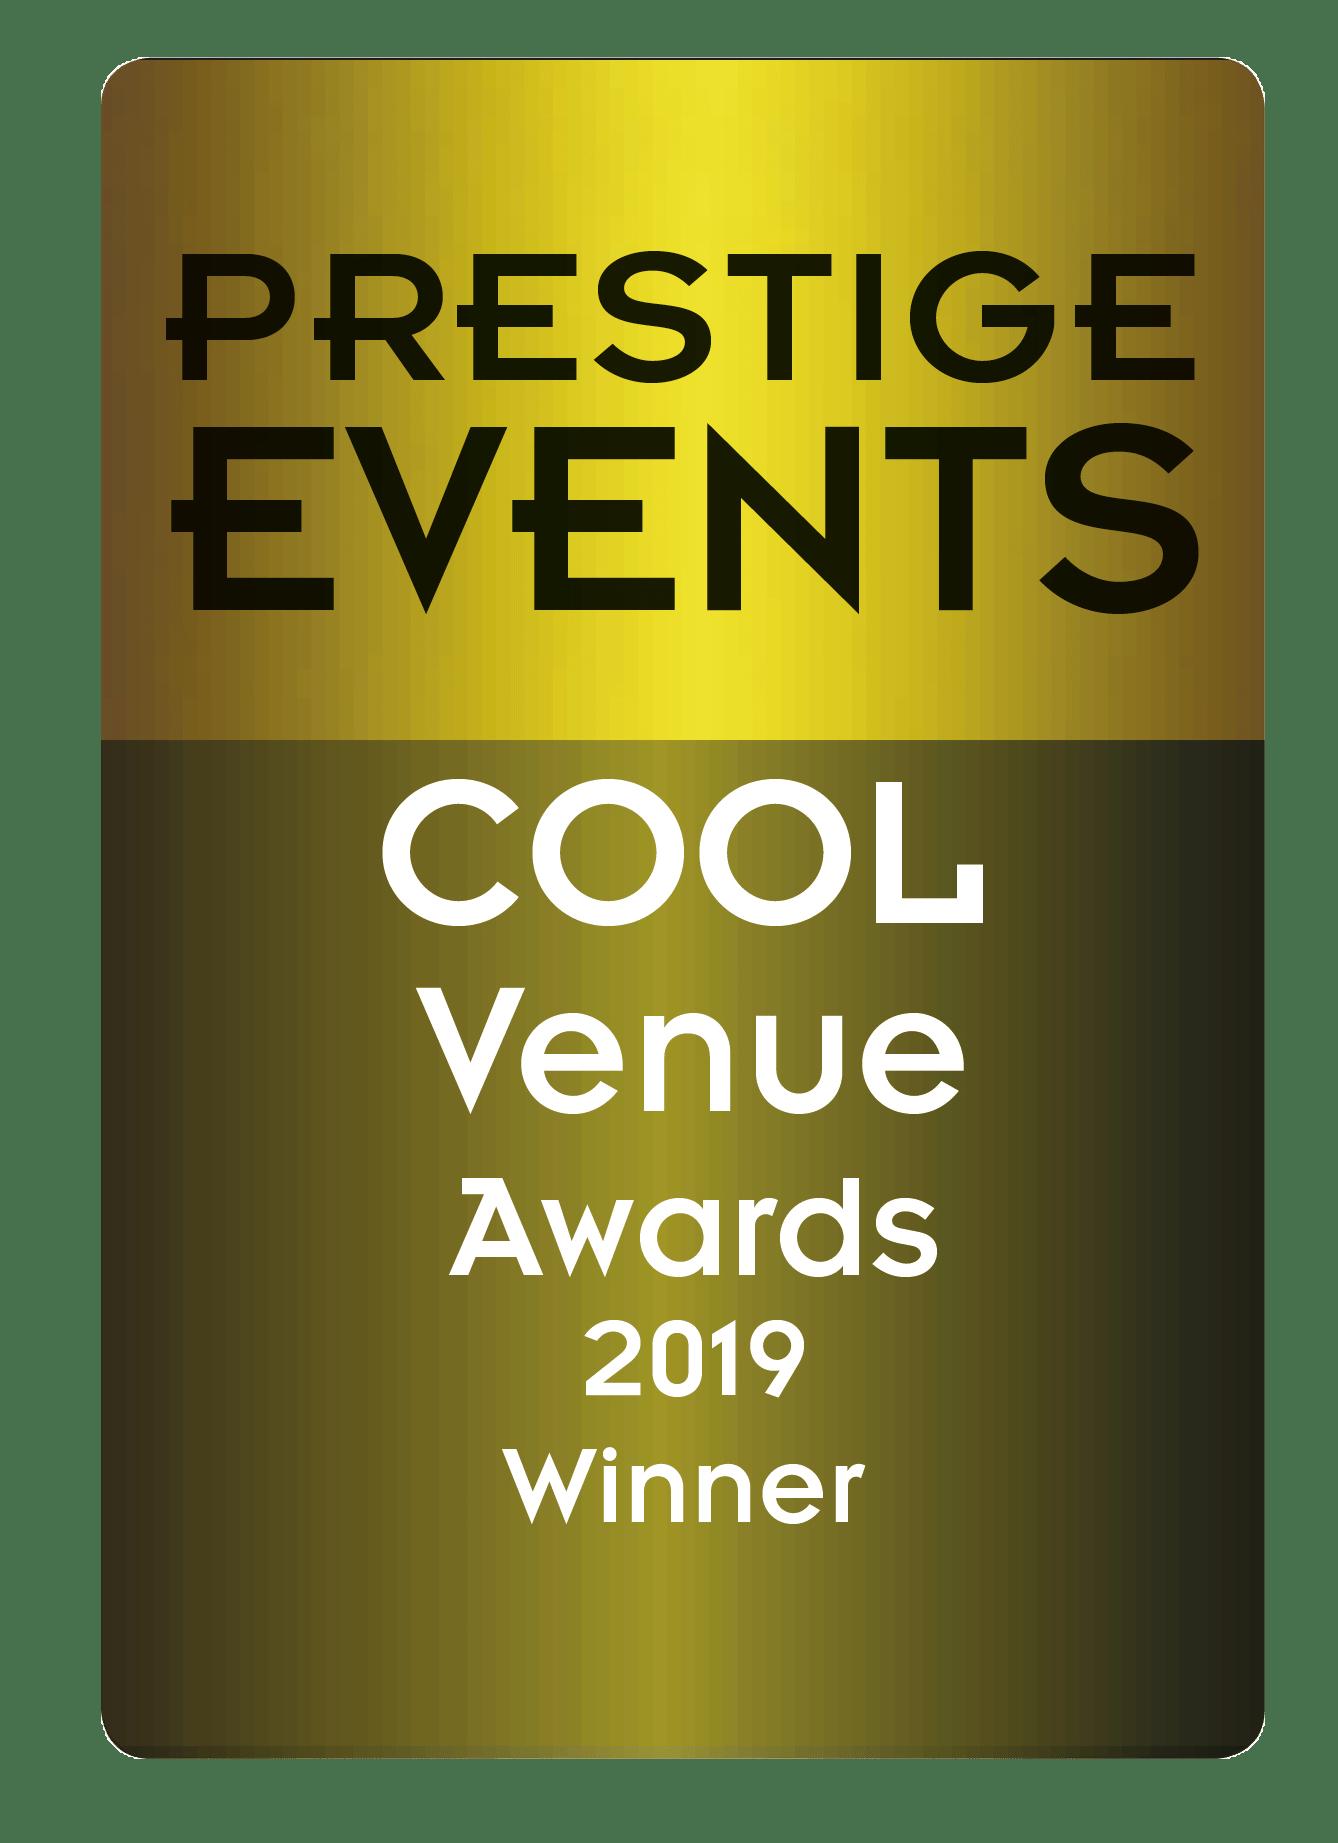 Prestige Events - Cool venue 2019 winner